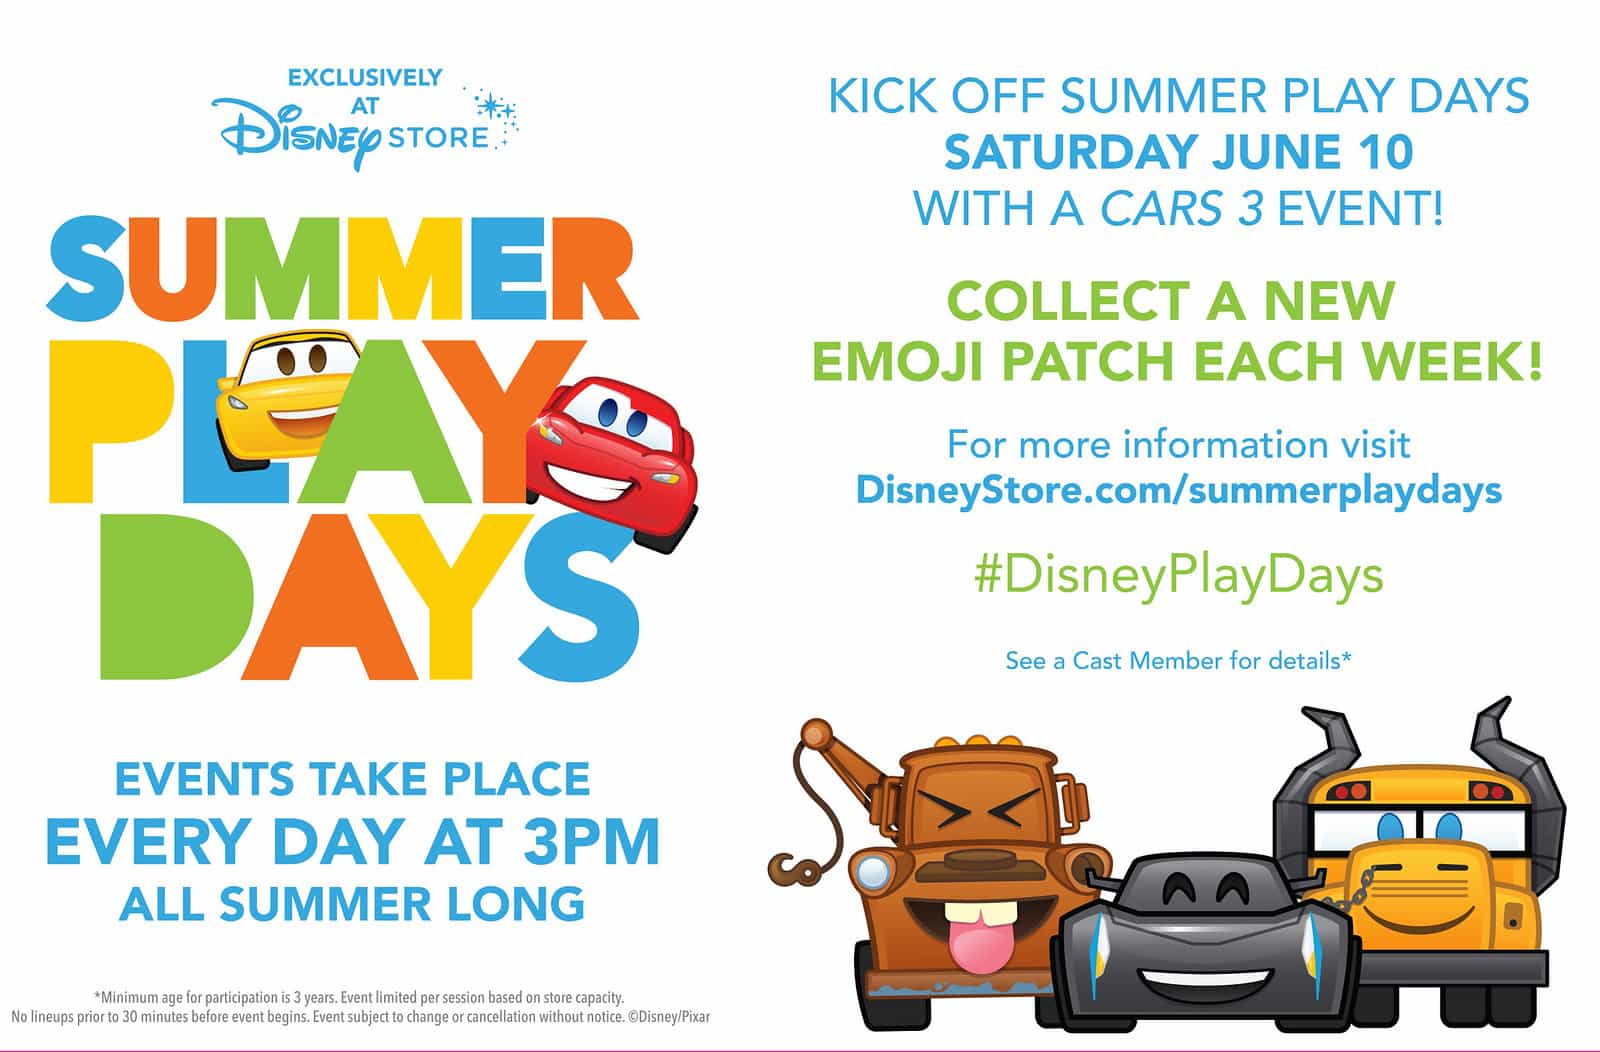 Disney Summer Play Days